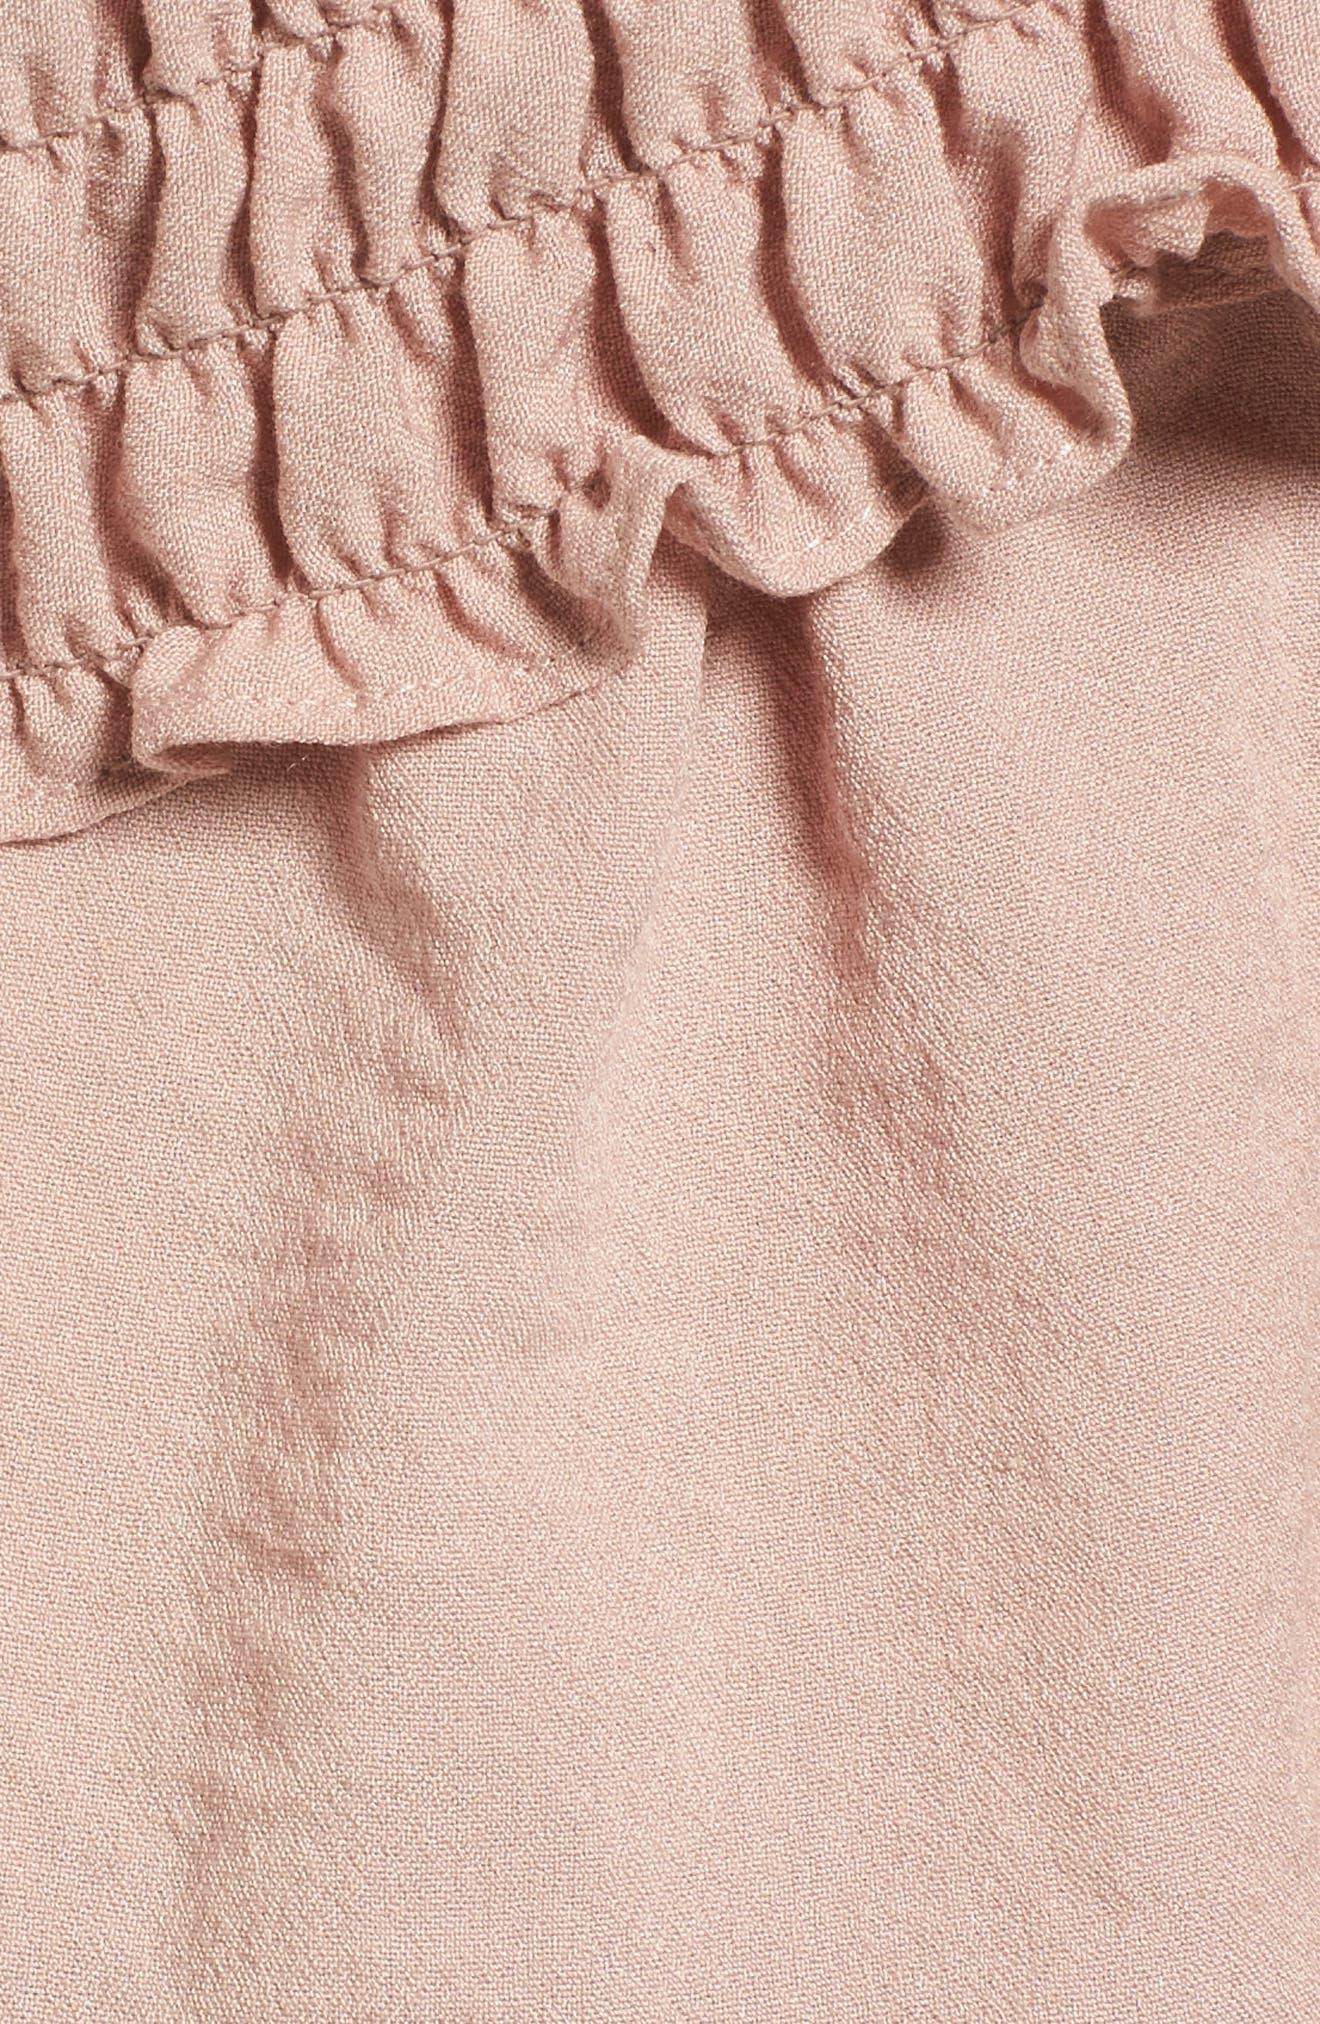 Delany Off the Shoulder Crop Top,                             Alternate thumbnail 5, color,                             Primrose Pink